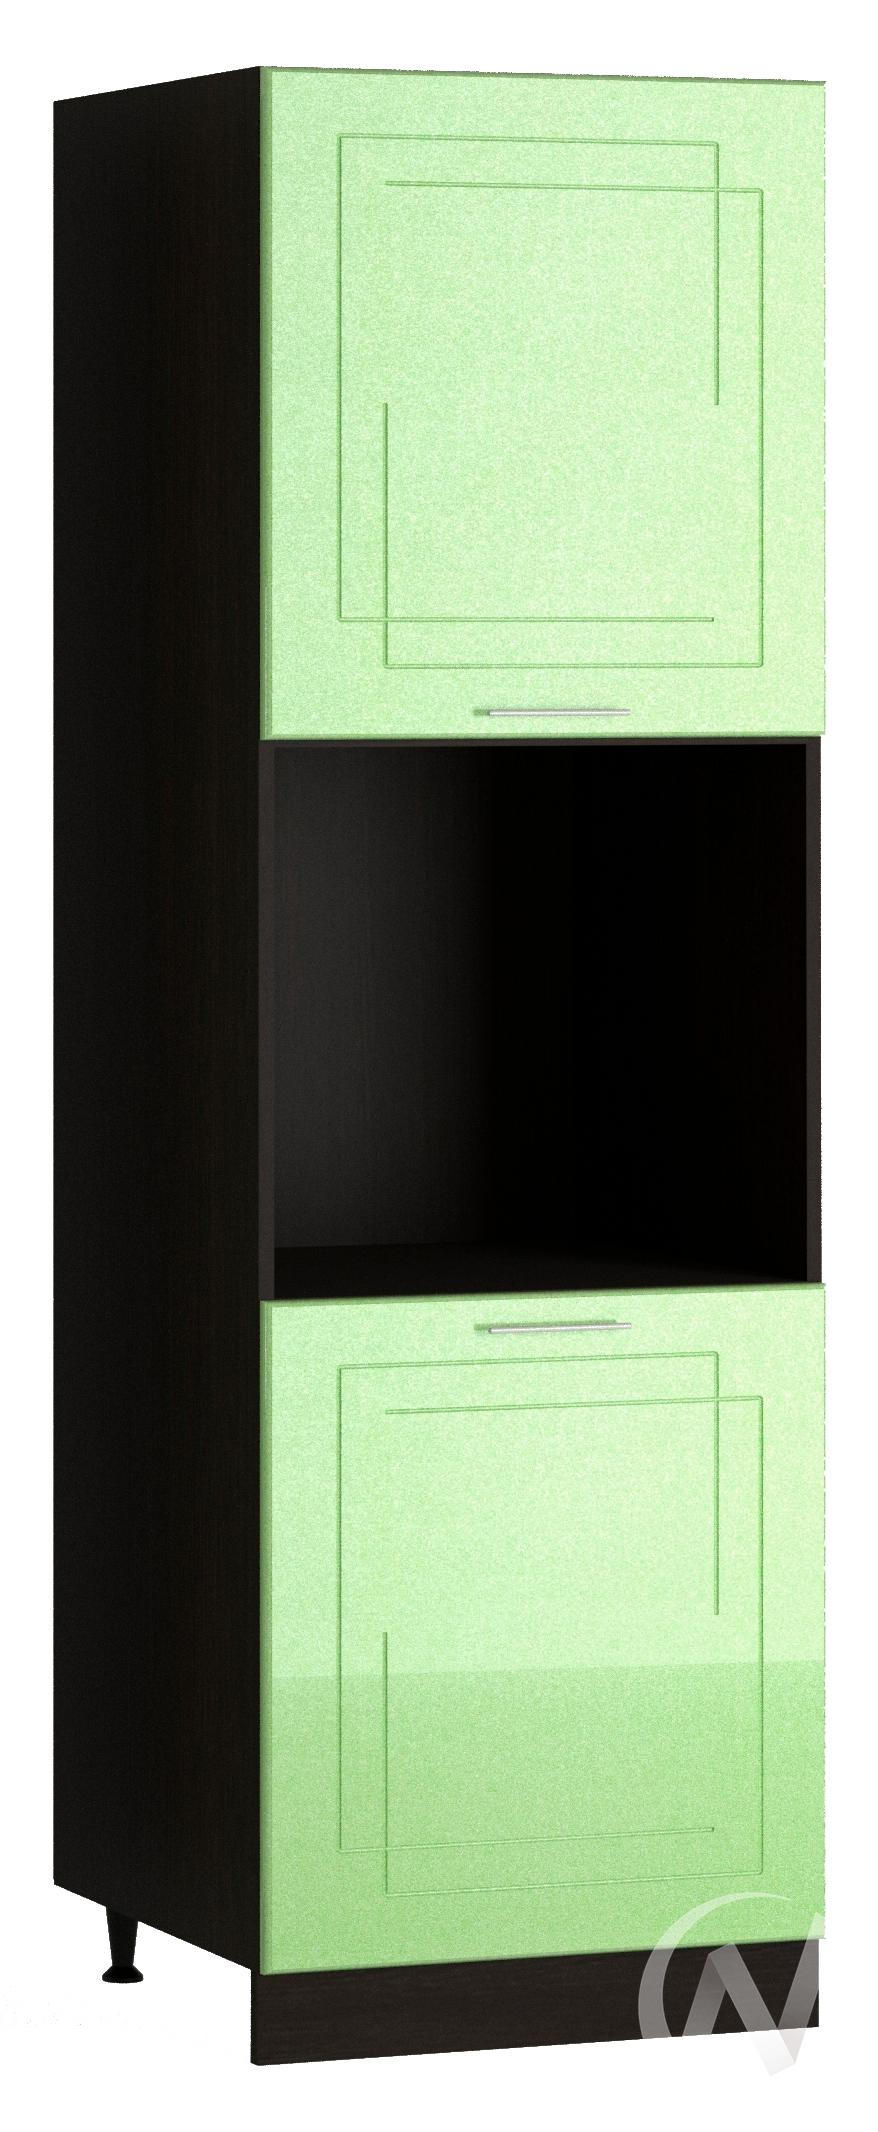 "Кухня ""Вега"": Шкаф пенал 600, ШП 600 (салатовый металлик/корпус венге)"